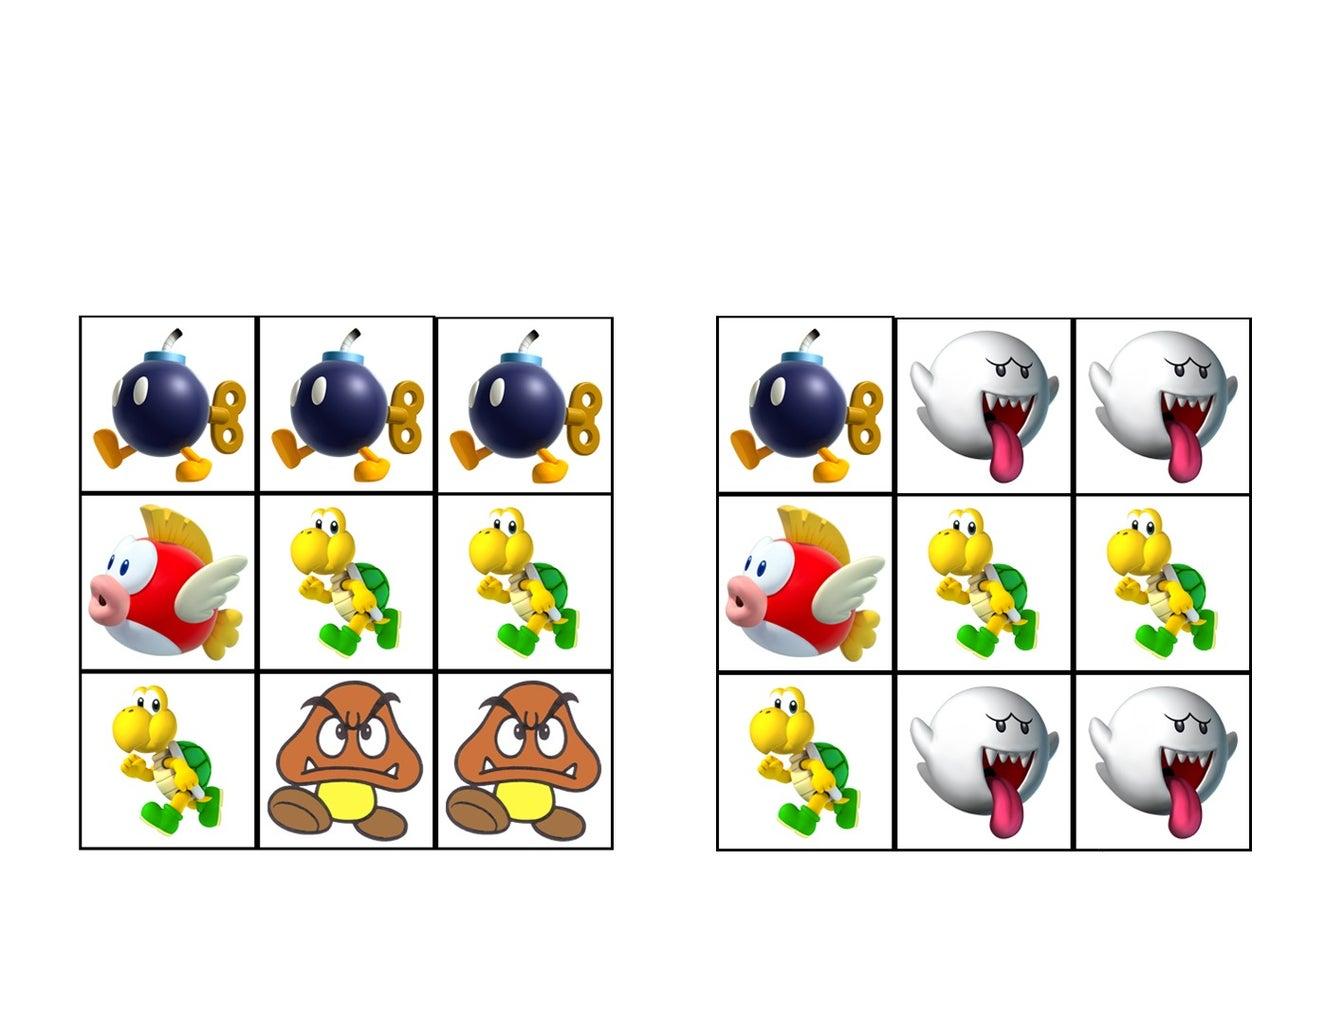 Bowser's Bogus Bingo